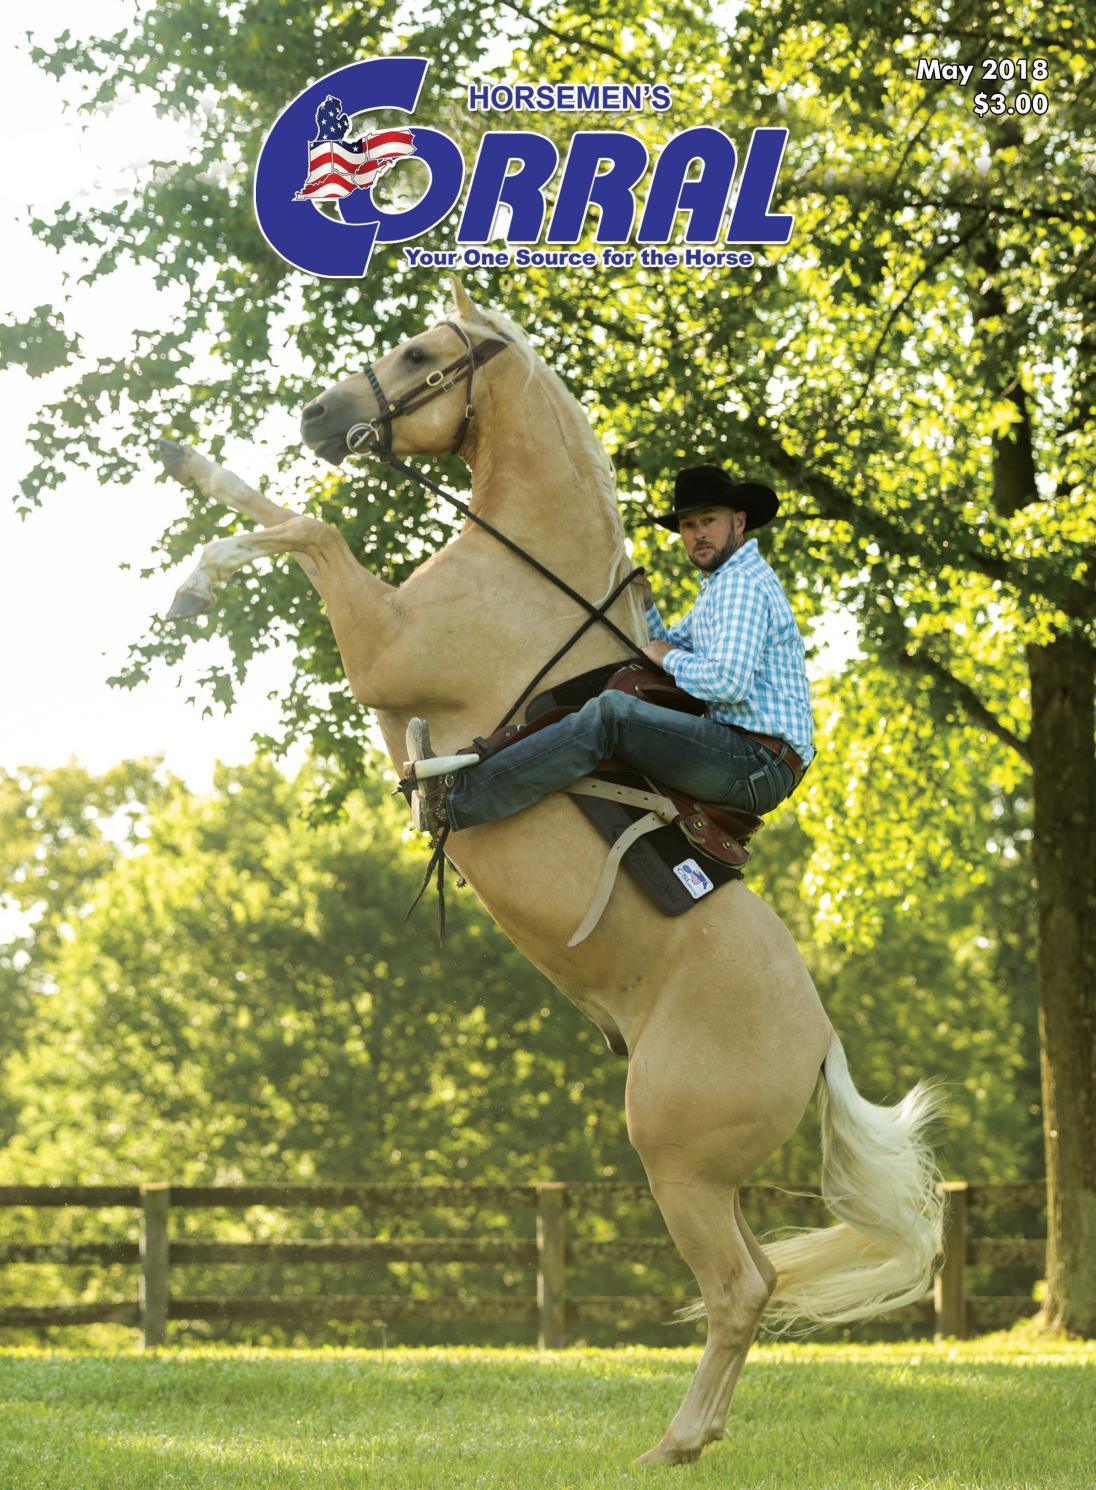 Horsemen's Corral May 2018 by Horsemen's Corral - issuu